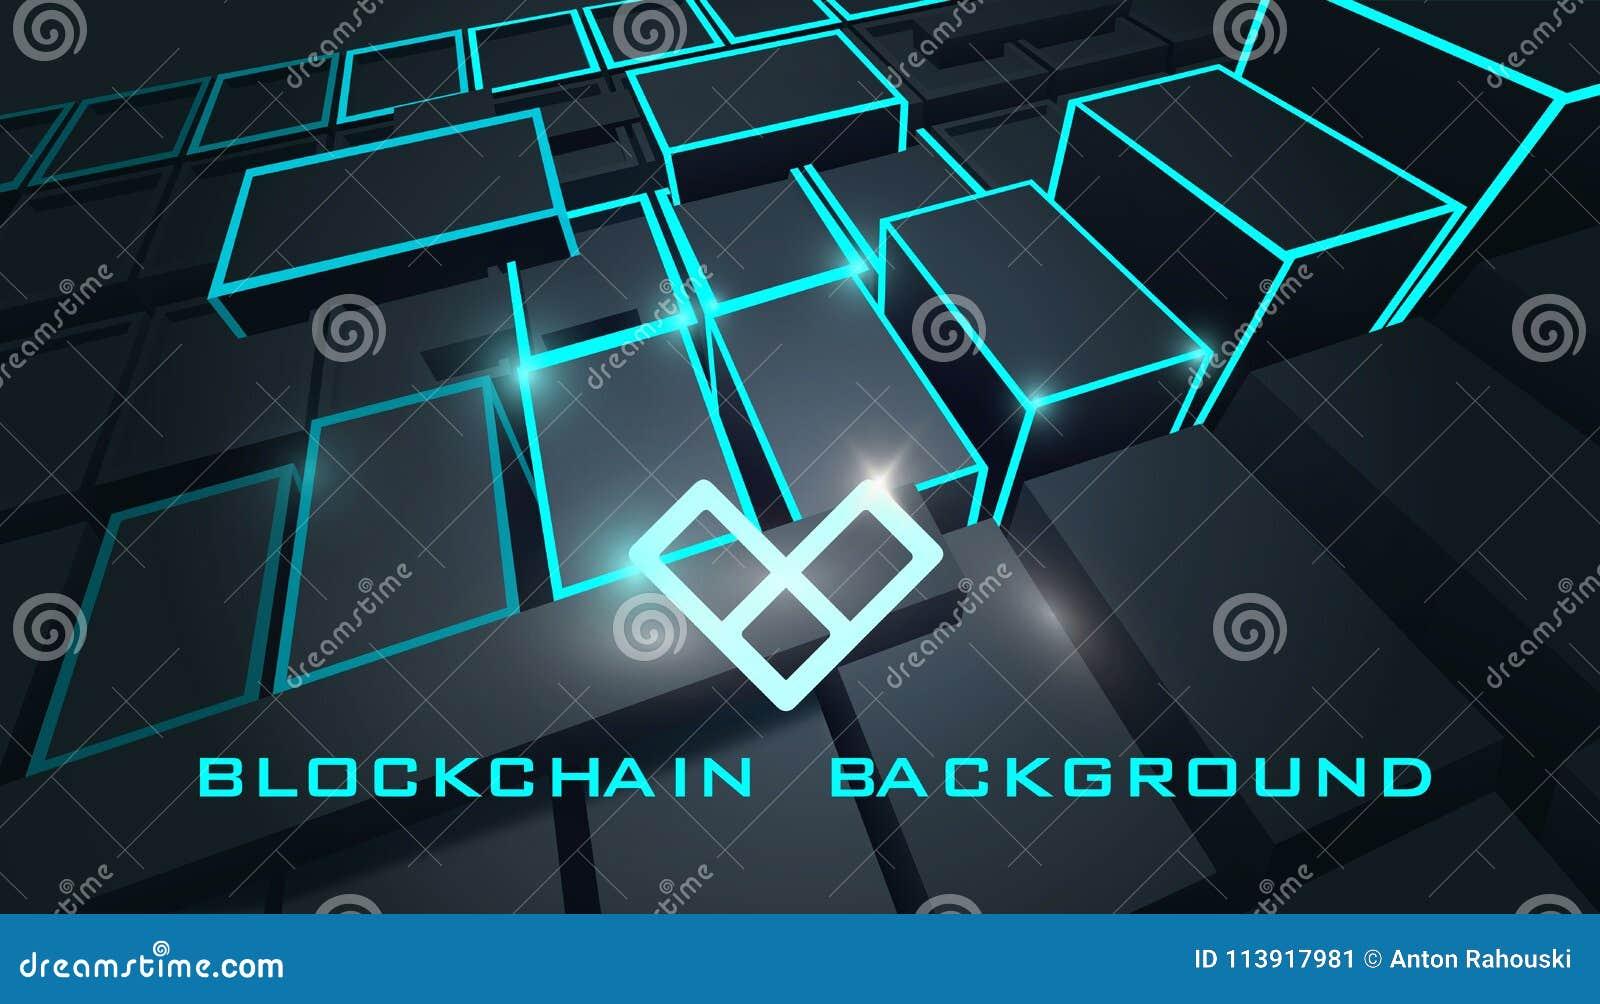 Blockchain Technology Background Abstract Blockchain